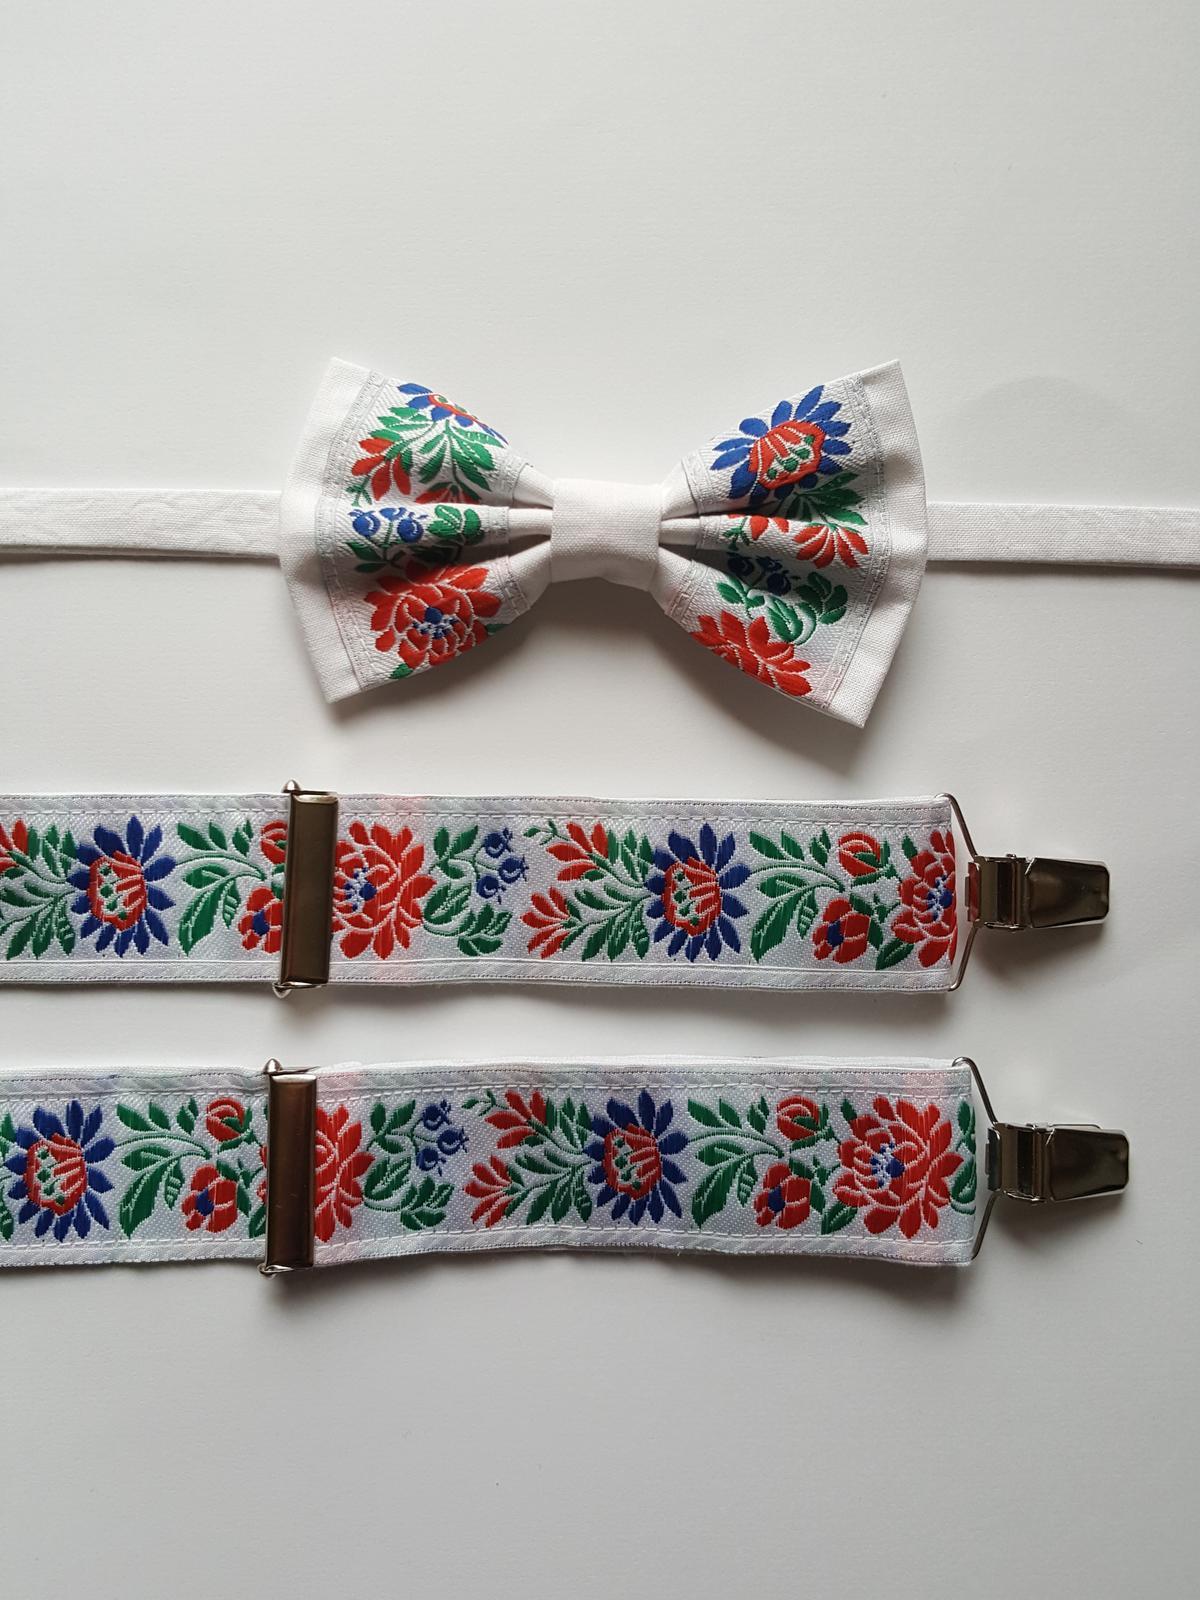 Pánsky folklórny motýlik a traky - set - Obrázok č. 1